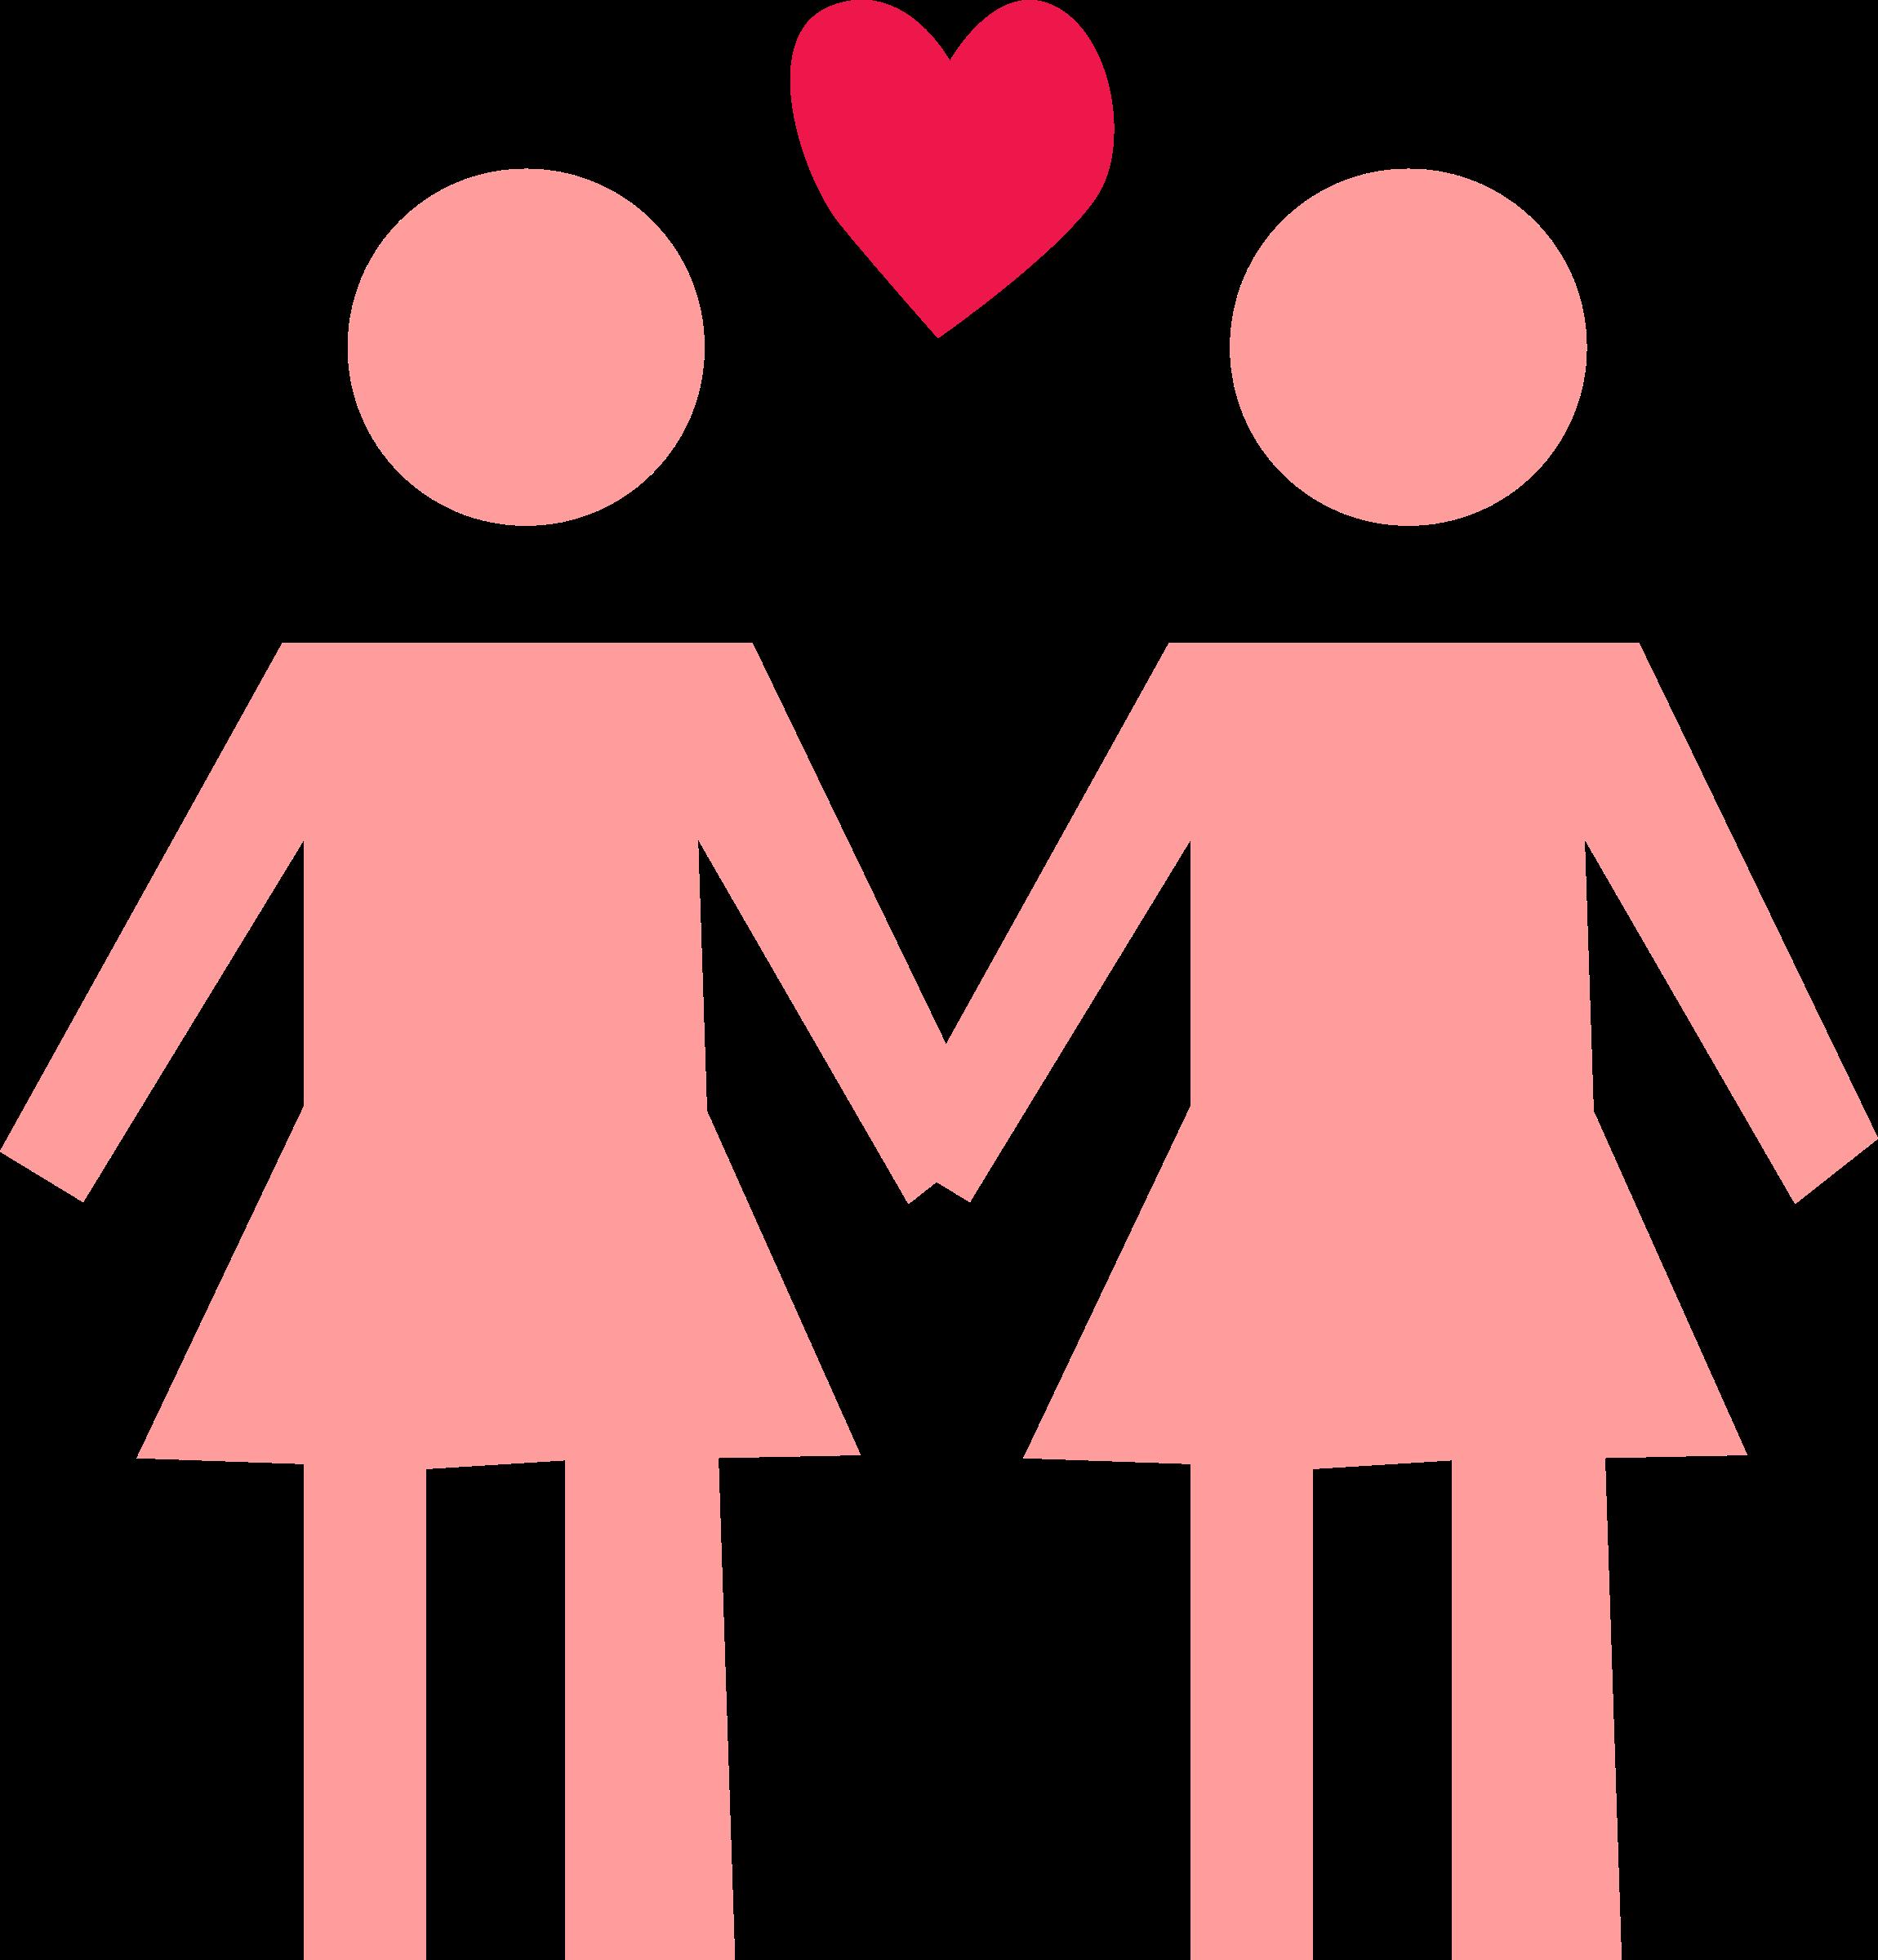 Clipart png couple. Lesbian big image